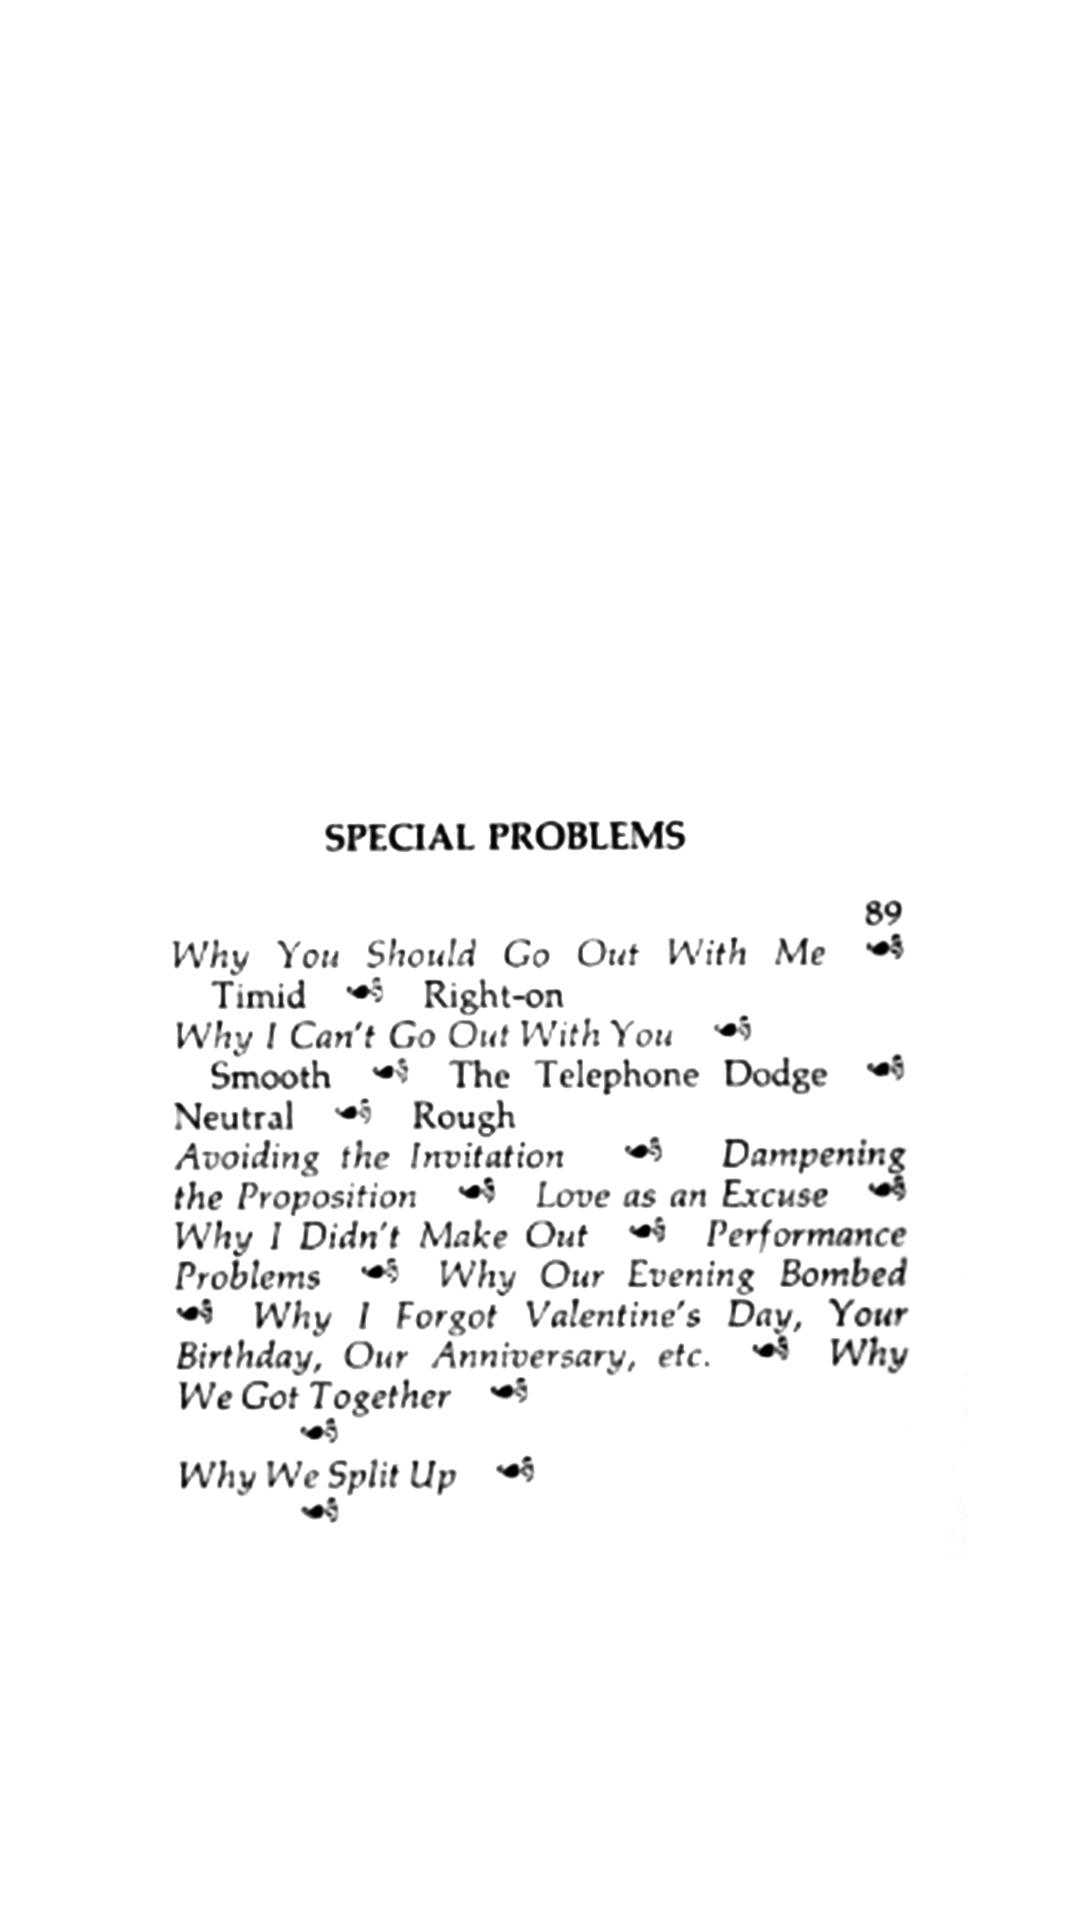 specialproblems.jpg